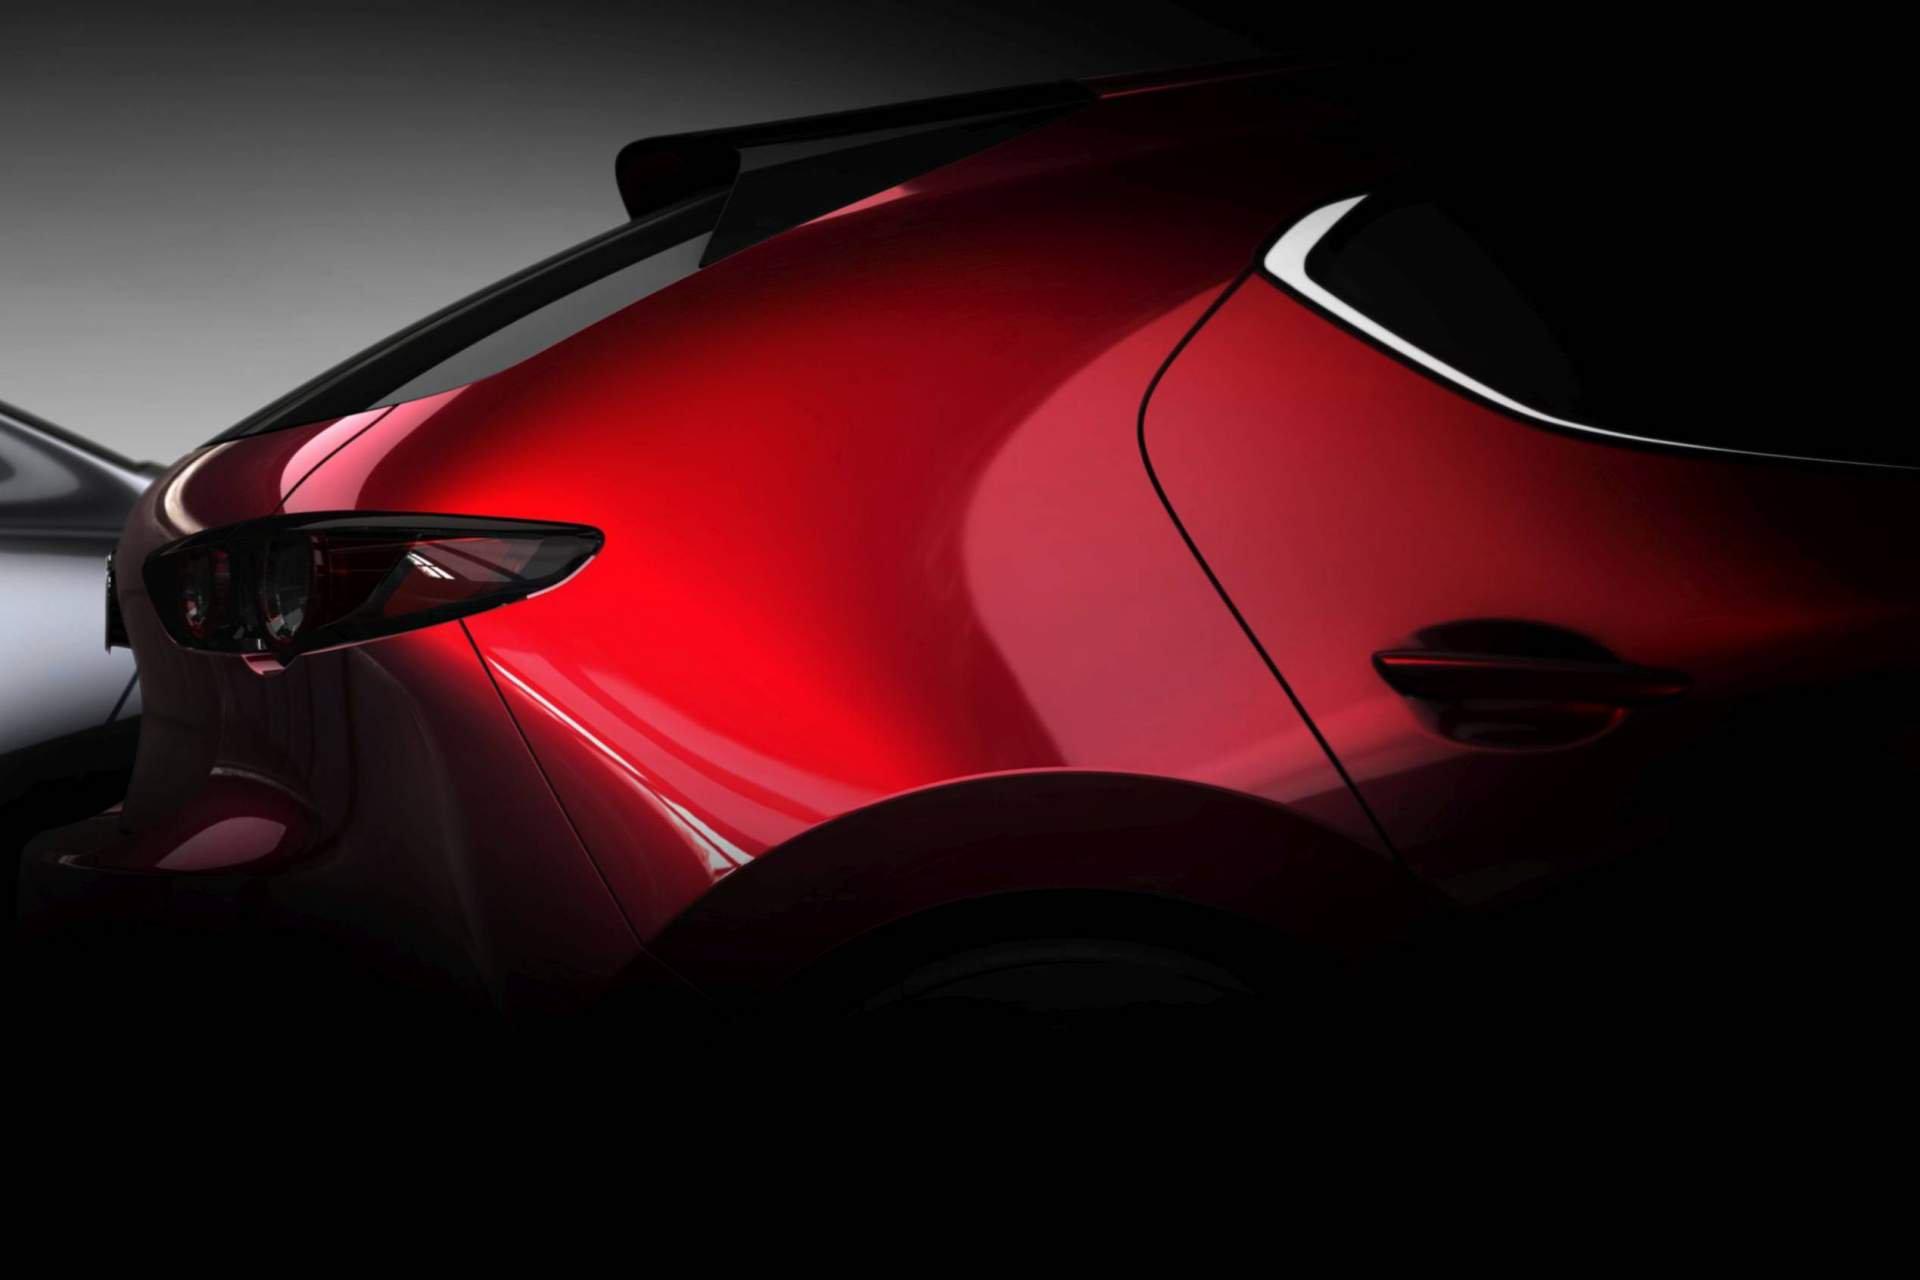 2019-mazda3-hatchback-3.jpg